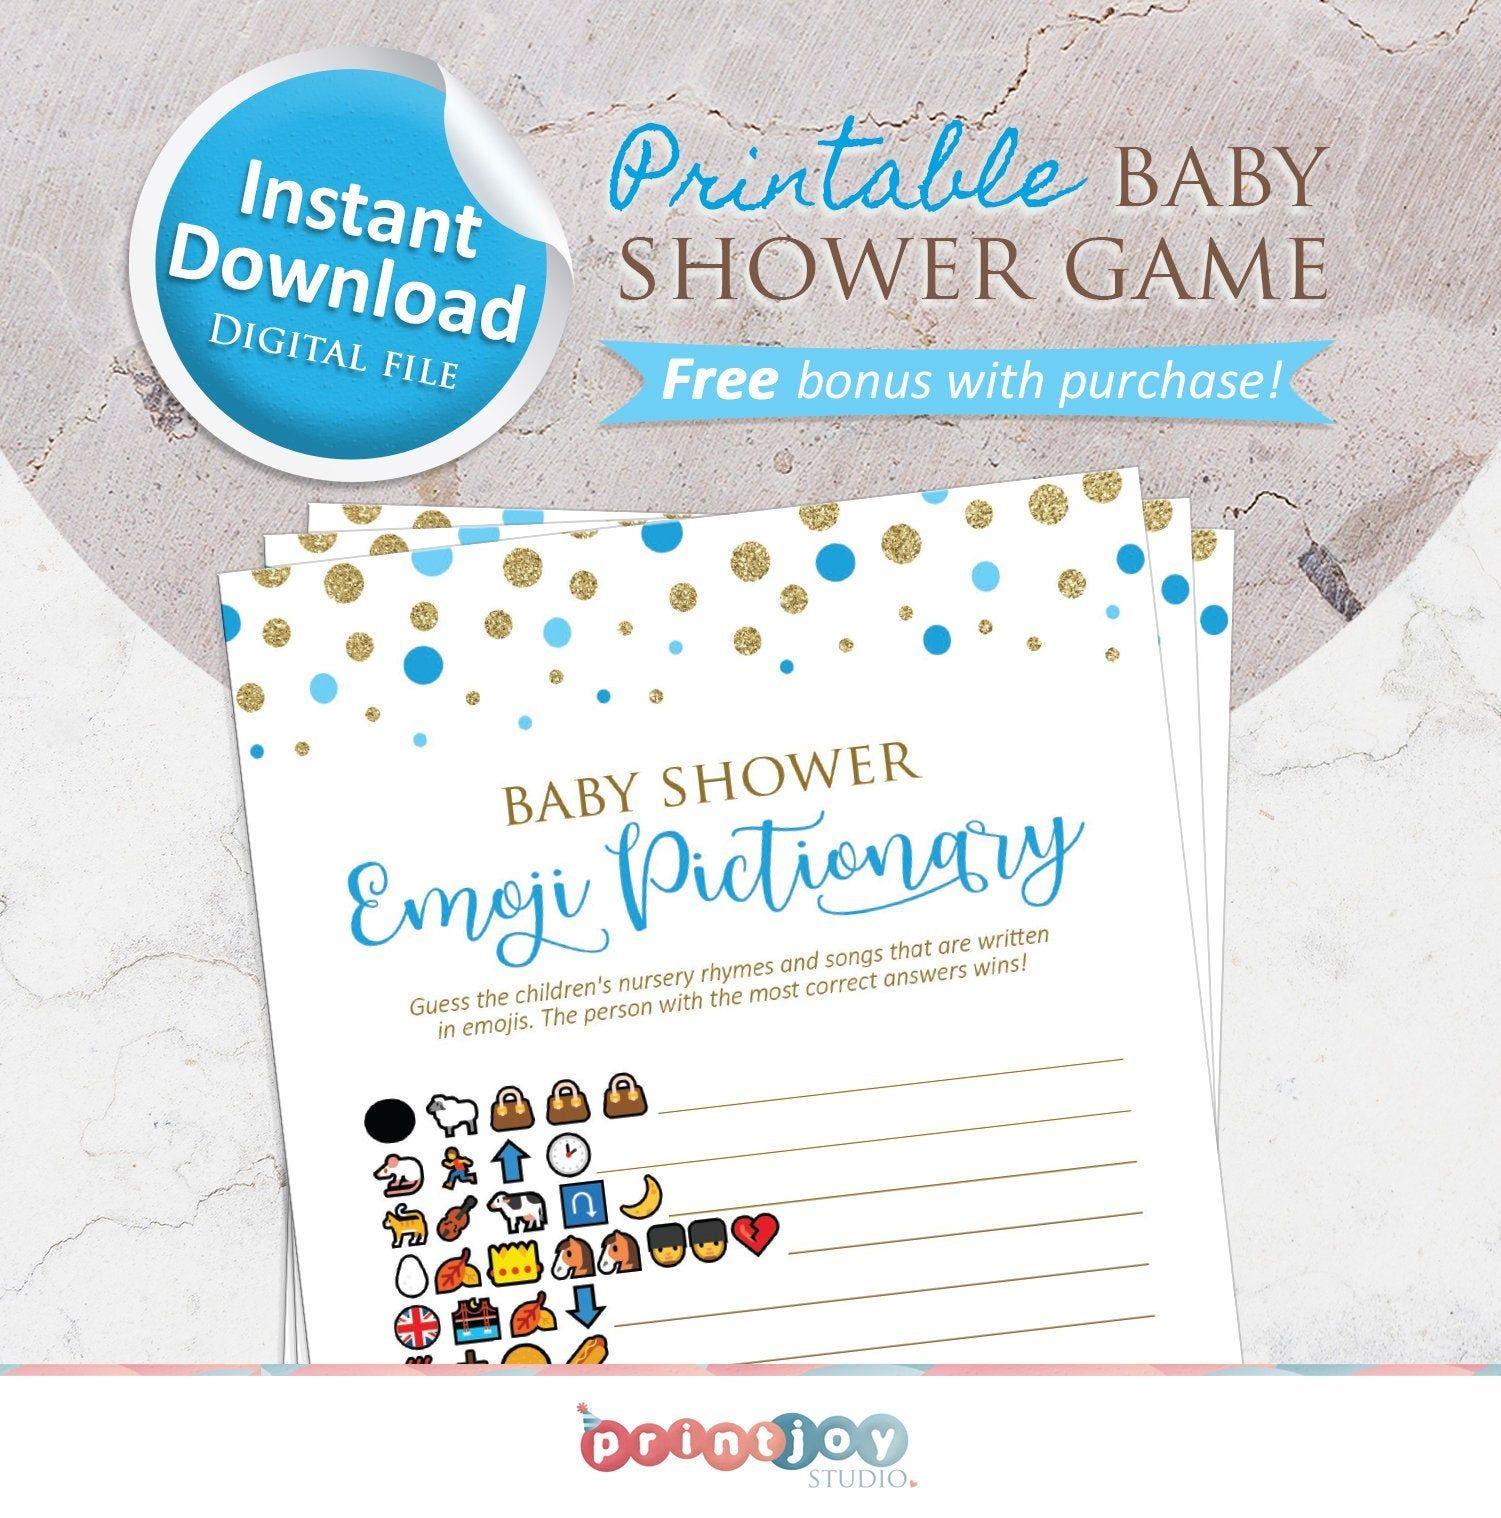 Emoji Baby Shower Games | Emoji Pictionary Game | Instant Download